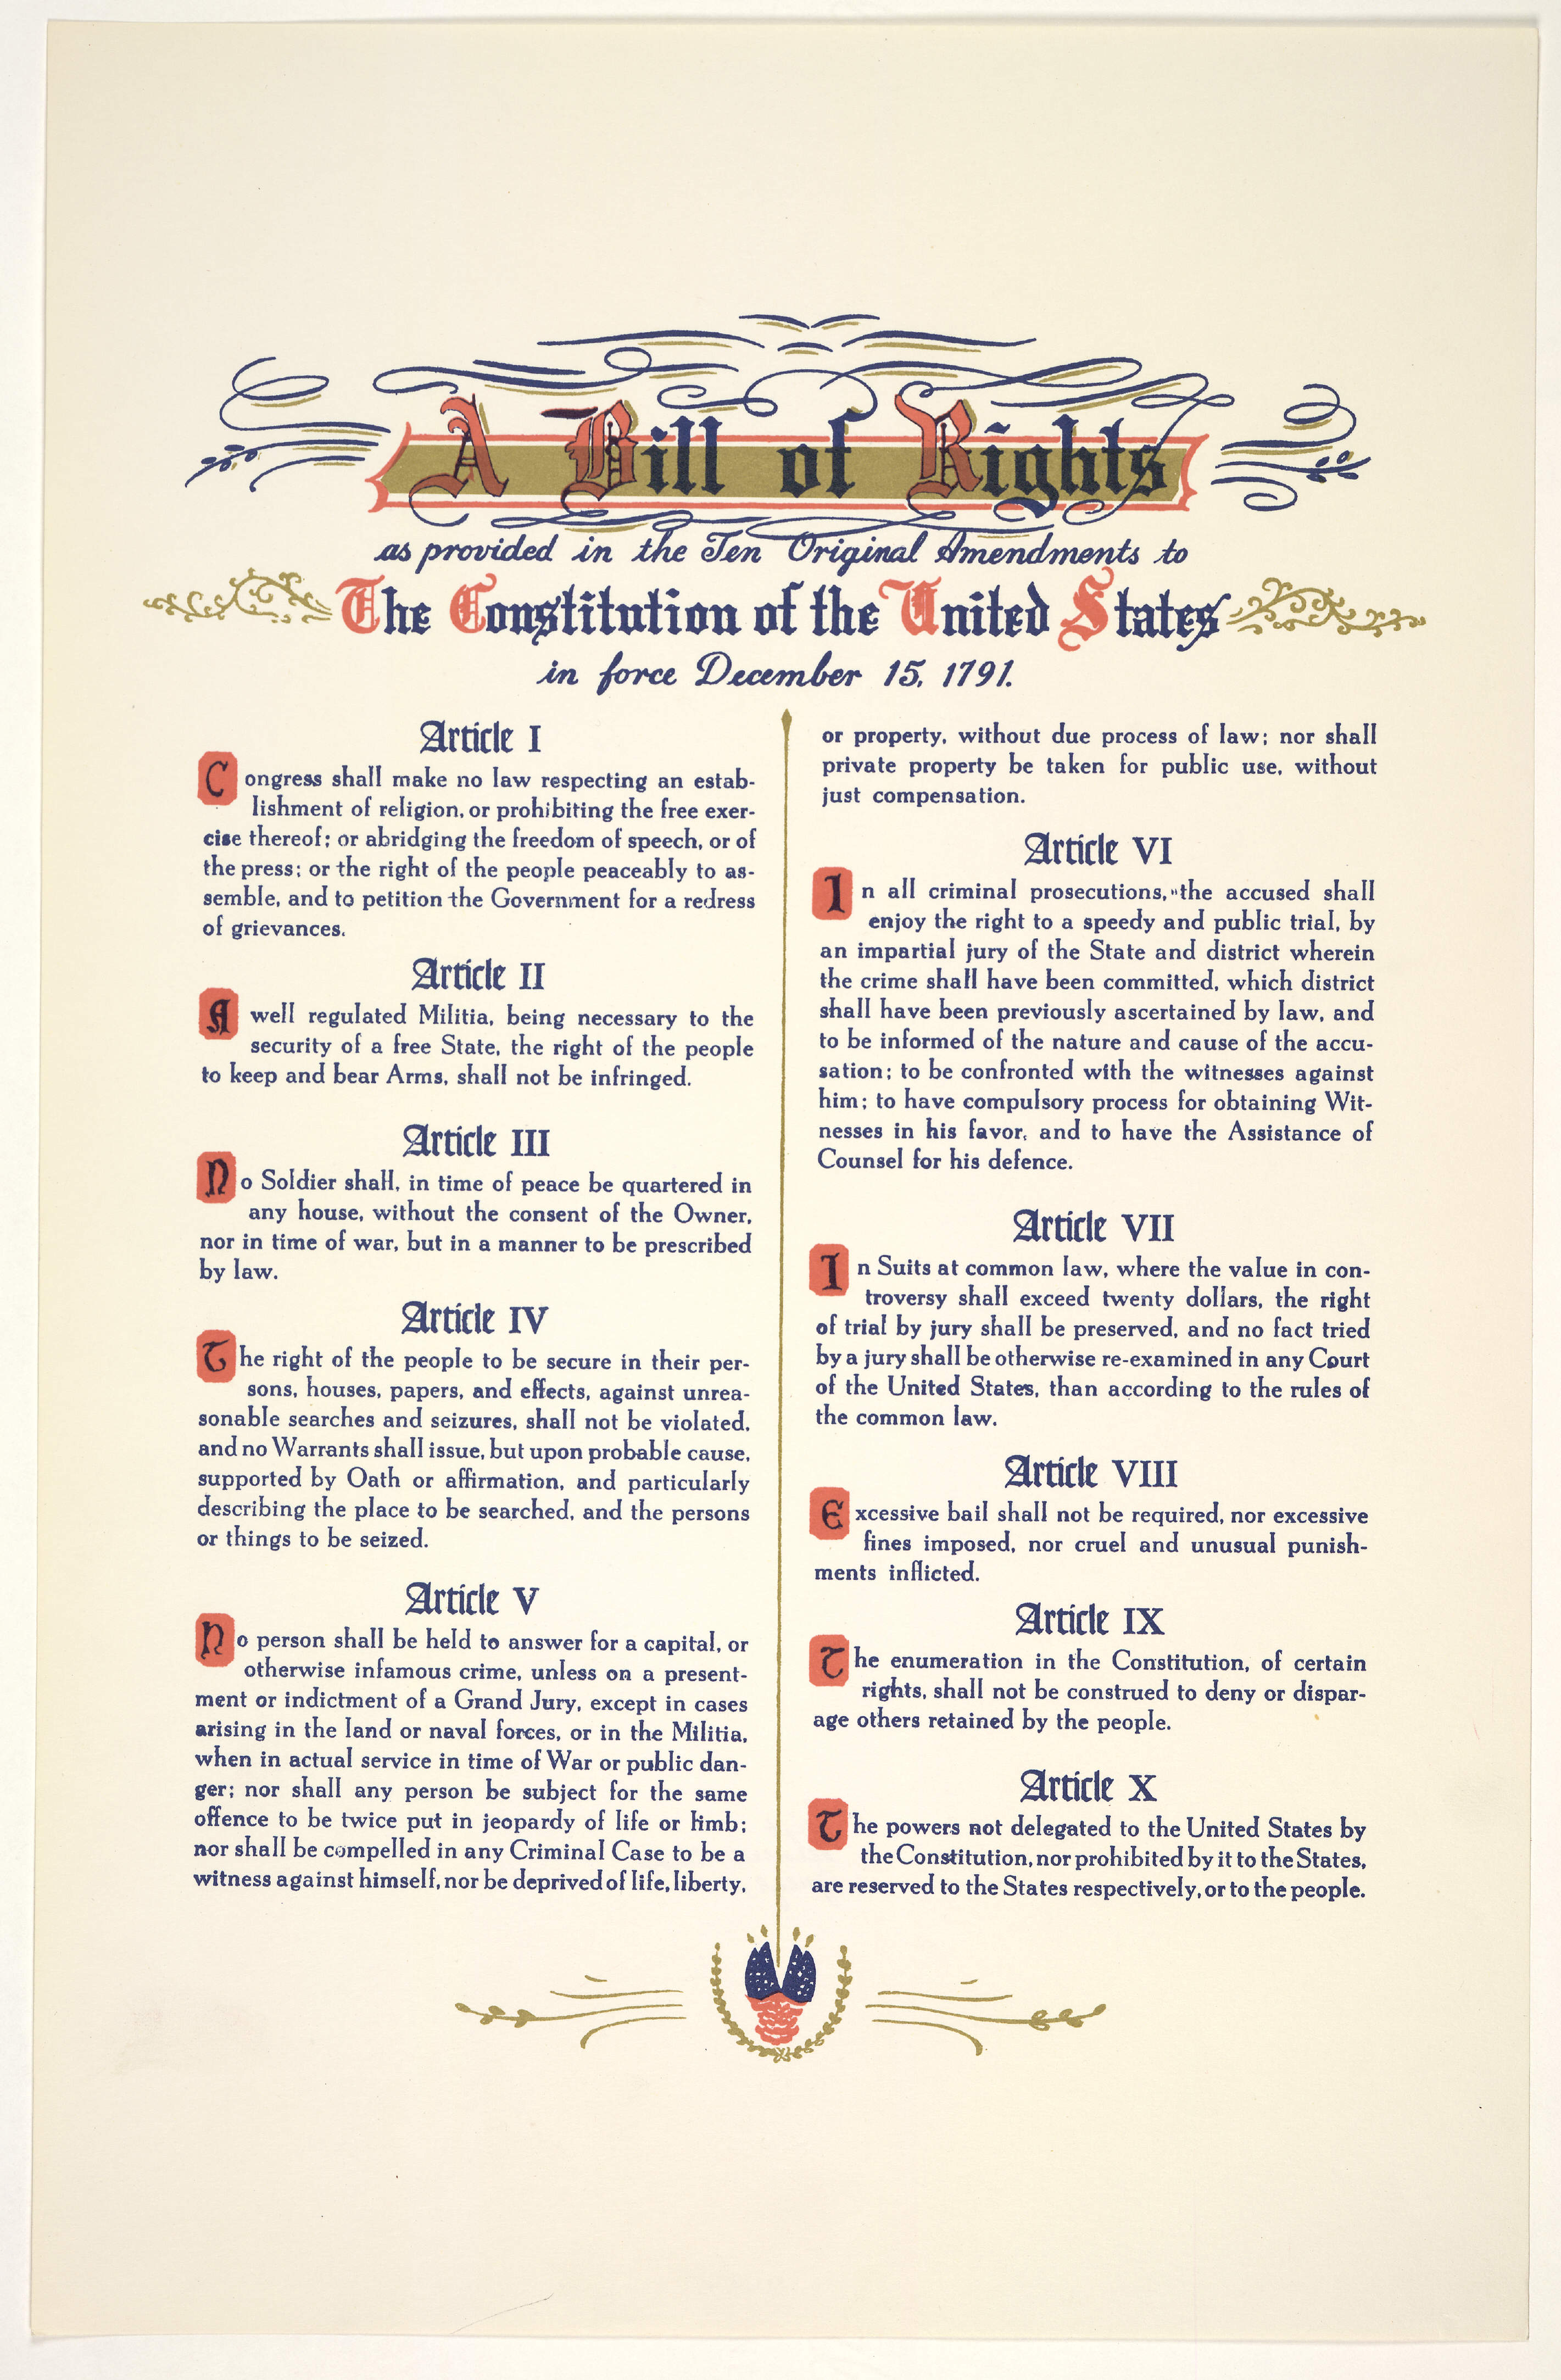 Bill of Rights | SERENDIPITY